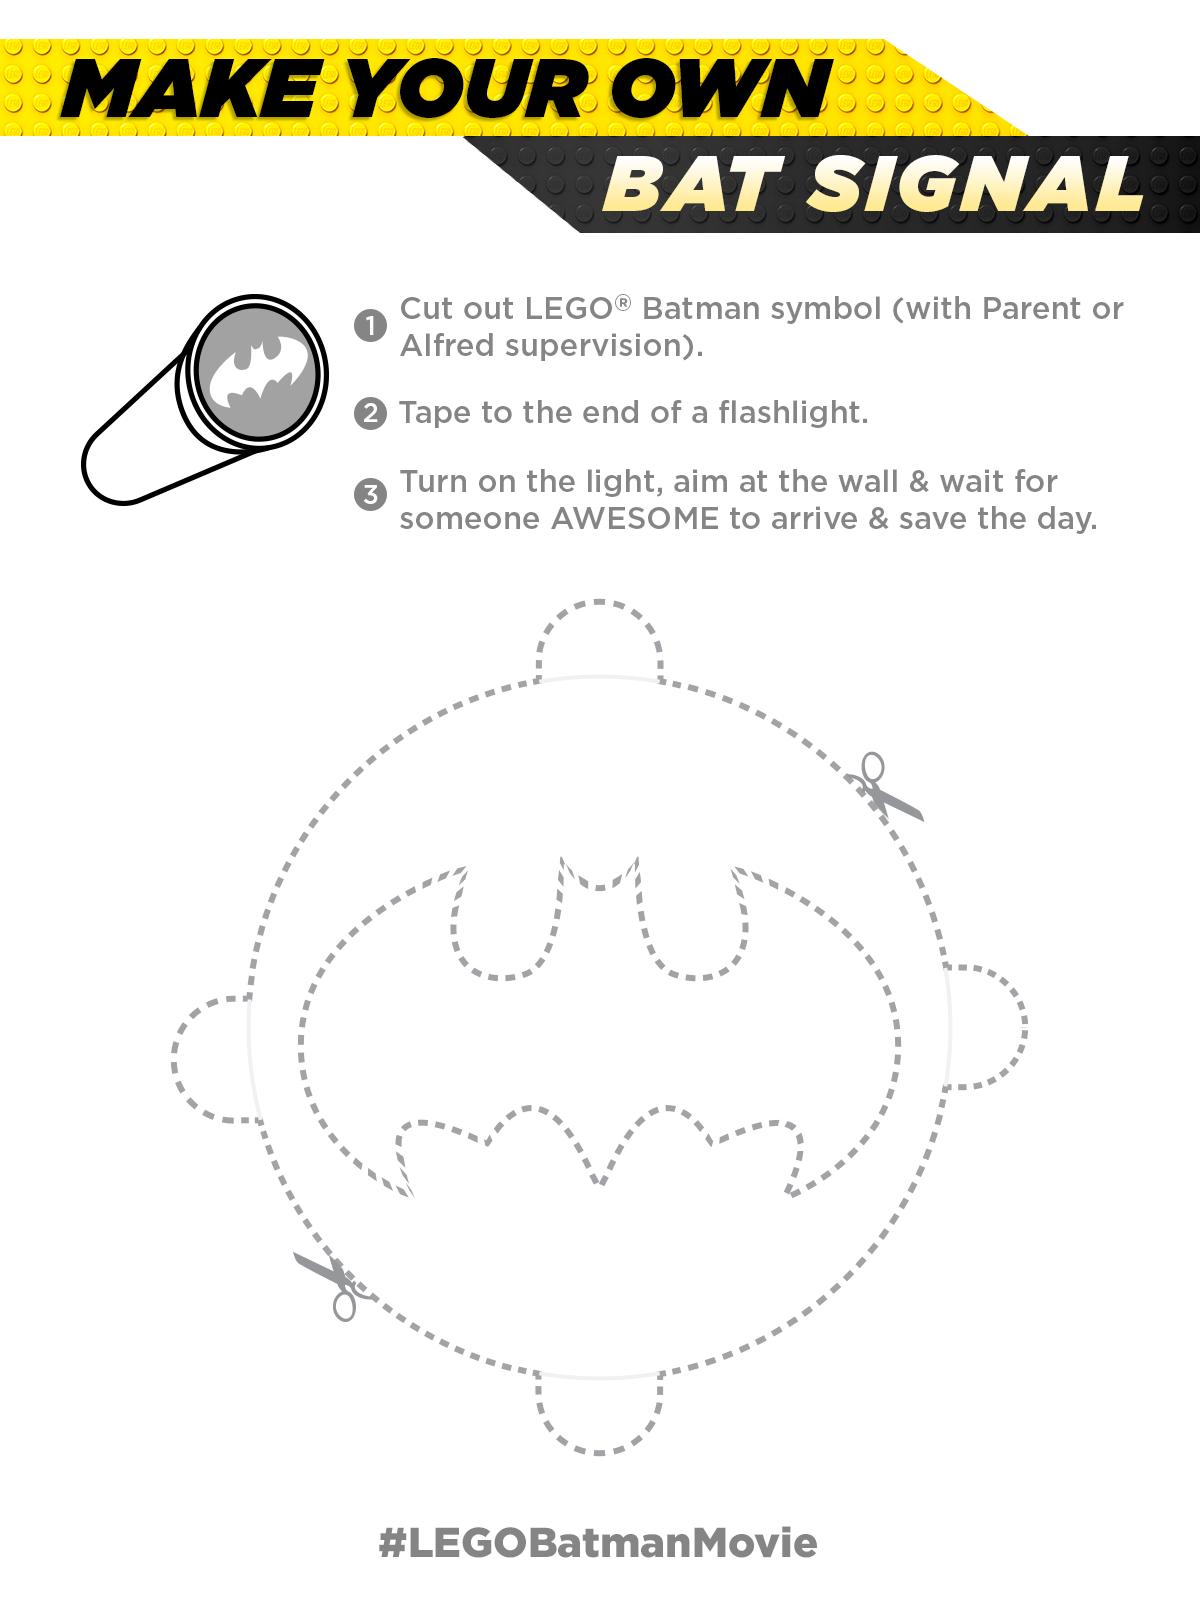 Get A Flashlight My Diy Cutout Bat Symbol And Presto You Have Your Own Bat Signal Please Only Use It For Emergen Lego Batman Party Lego Batman Batman Party